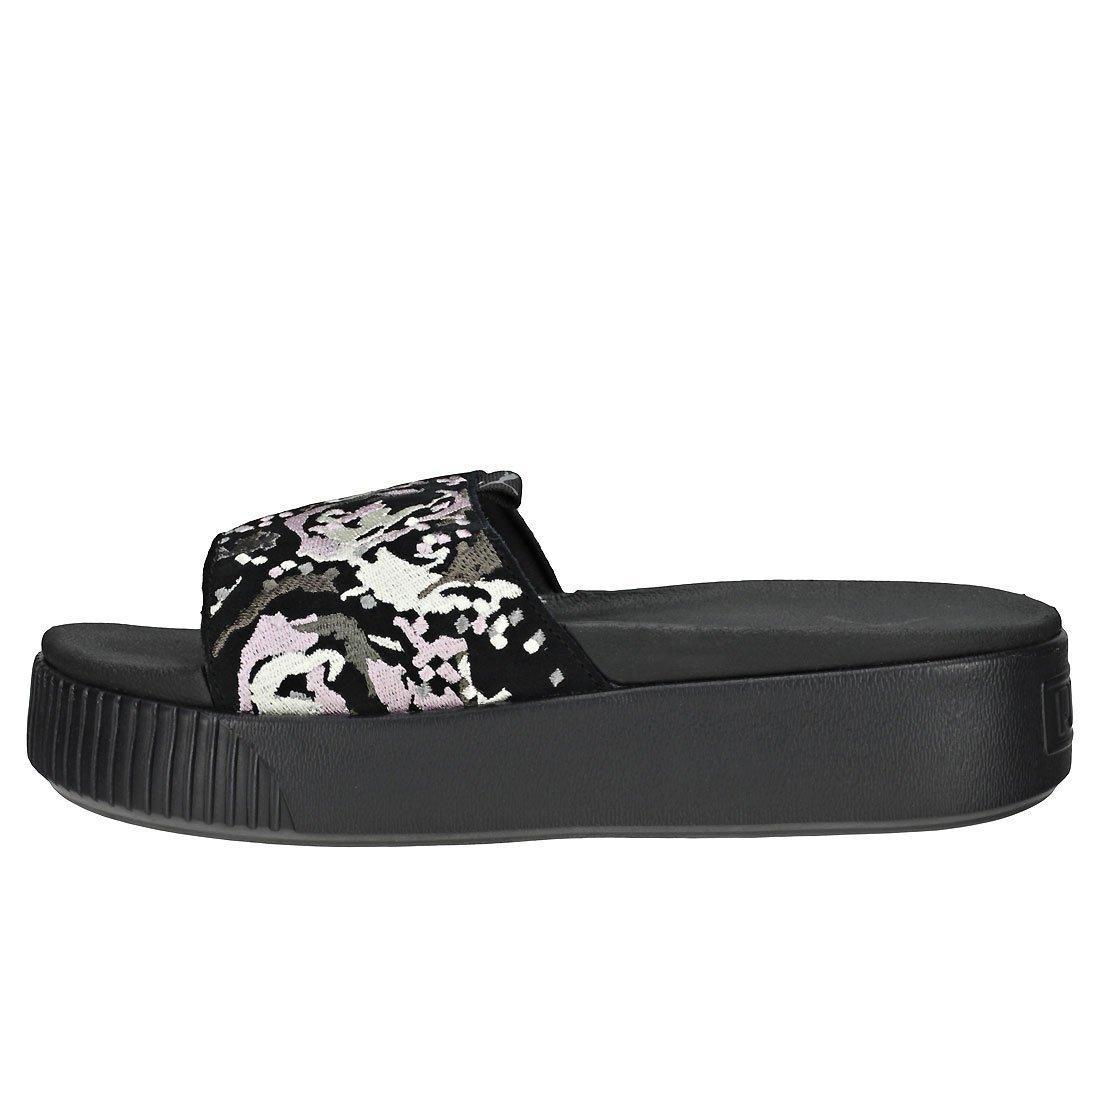 ba88013597b6 Puma Platform Digital Embroidery Womens Slide  Amazon.co.uk  Shoes   Bags